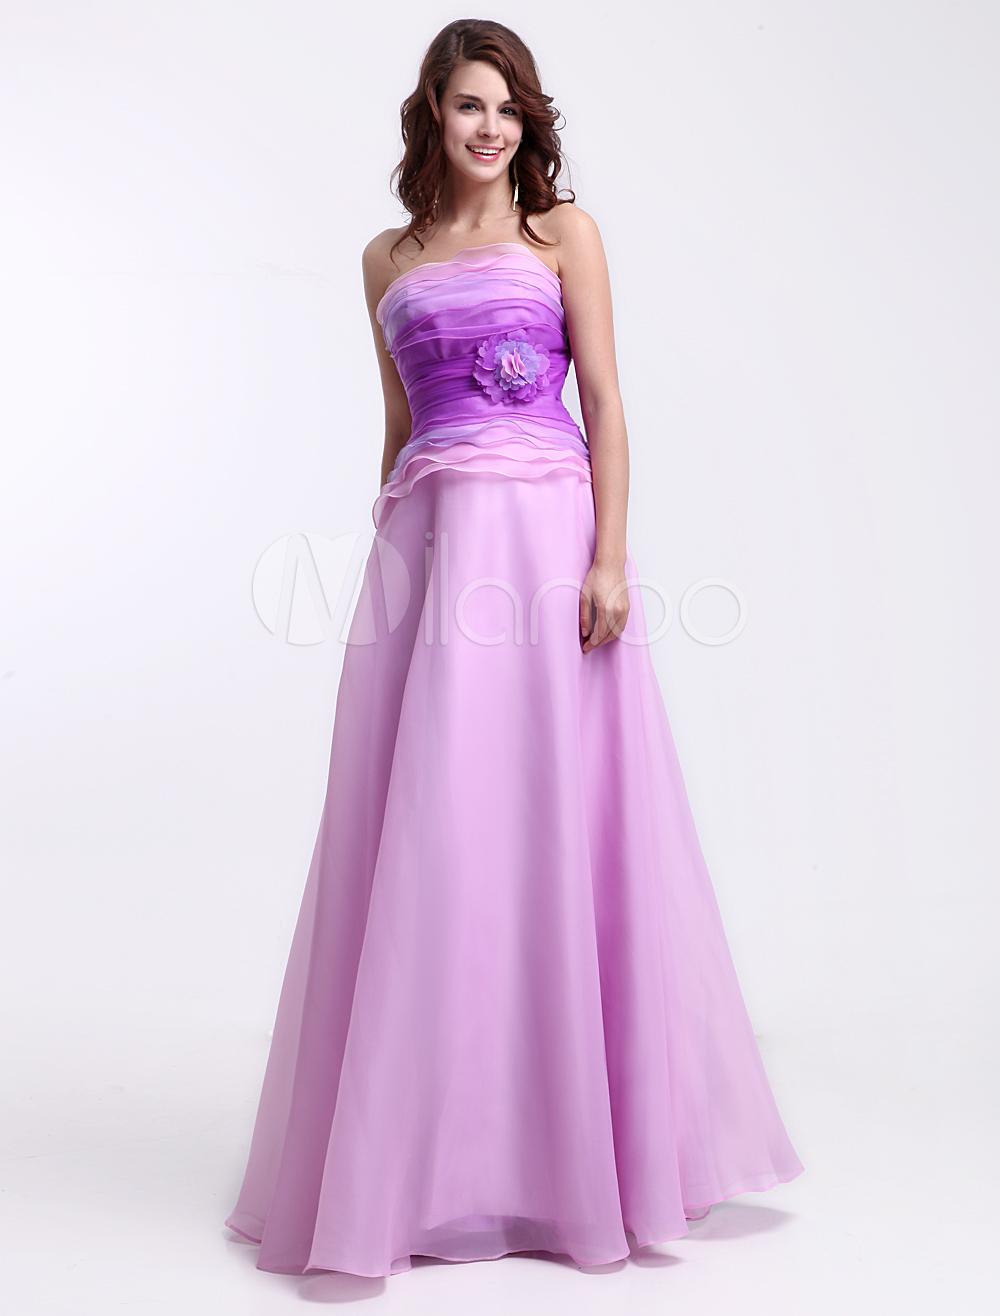 vestidos de gala de organza Rosa púrpura con escote palabra de honor ...